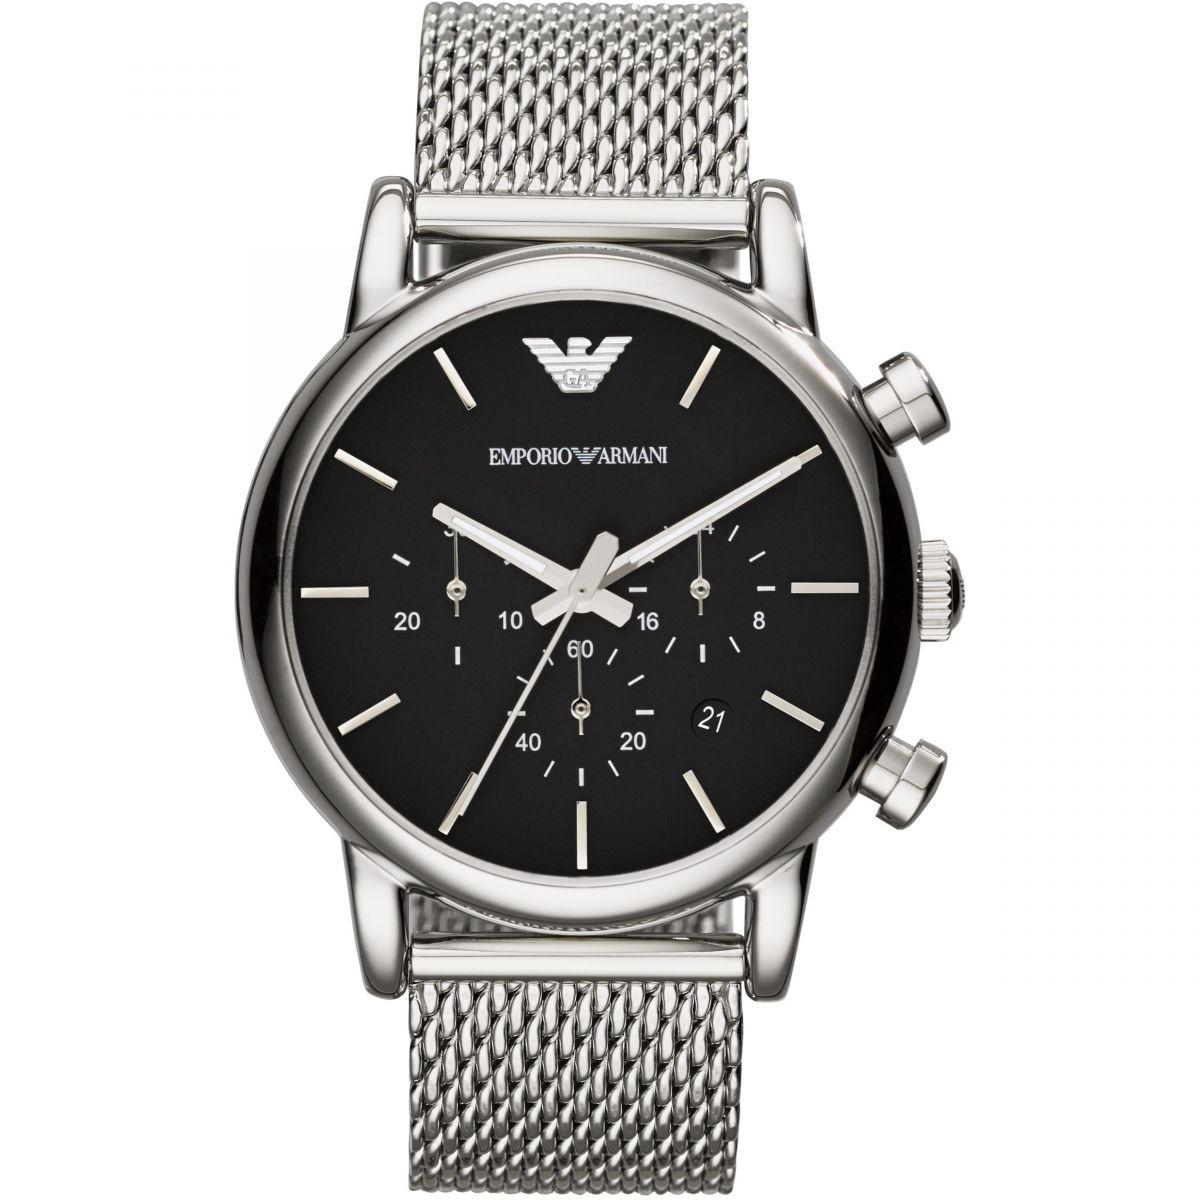 Cheap New Emporio Armani Ar1811 Chronograph Stainless Steel Bracelet Strap Watch Silver/Black for Men Online Sale Sale Online